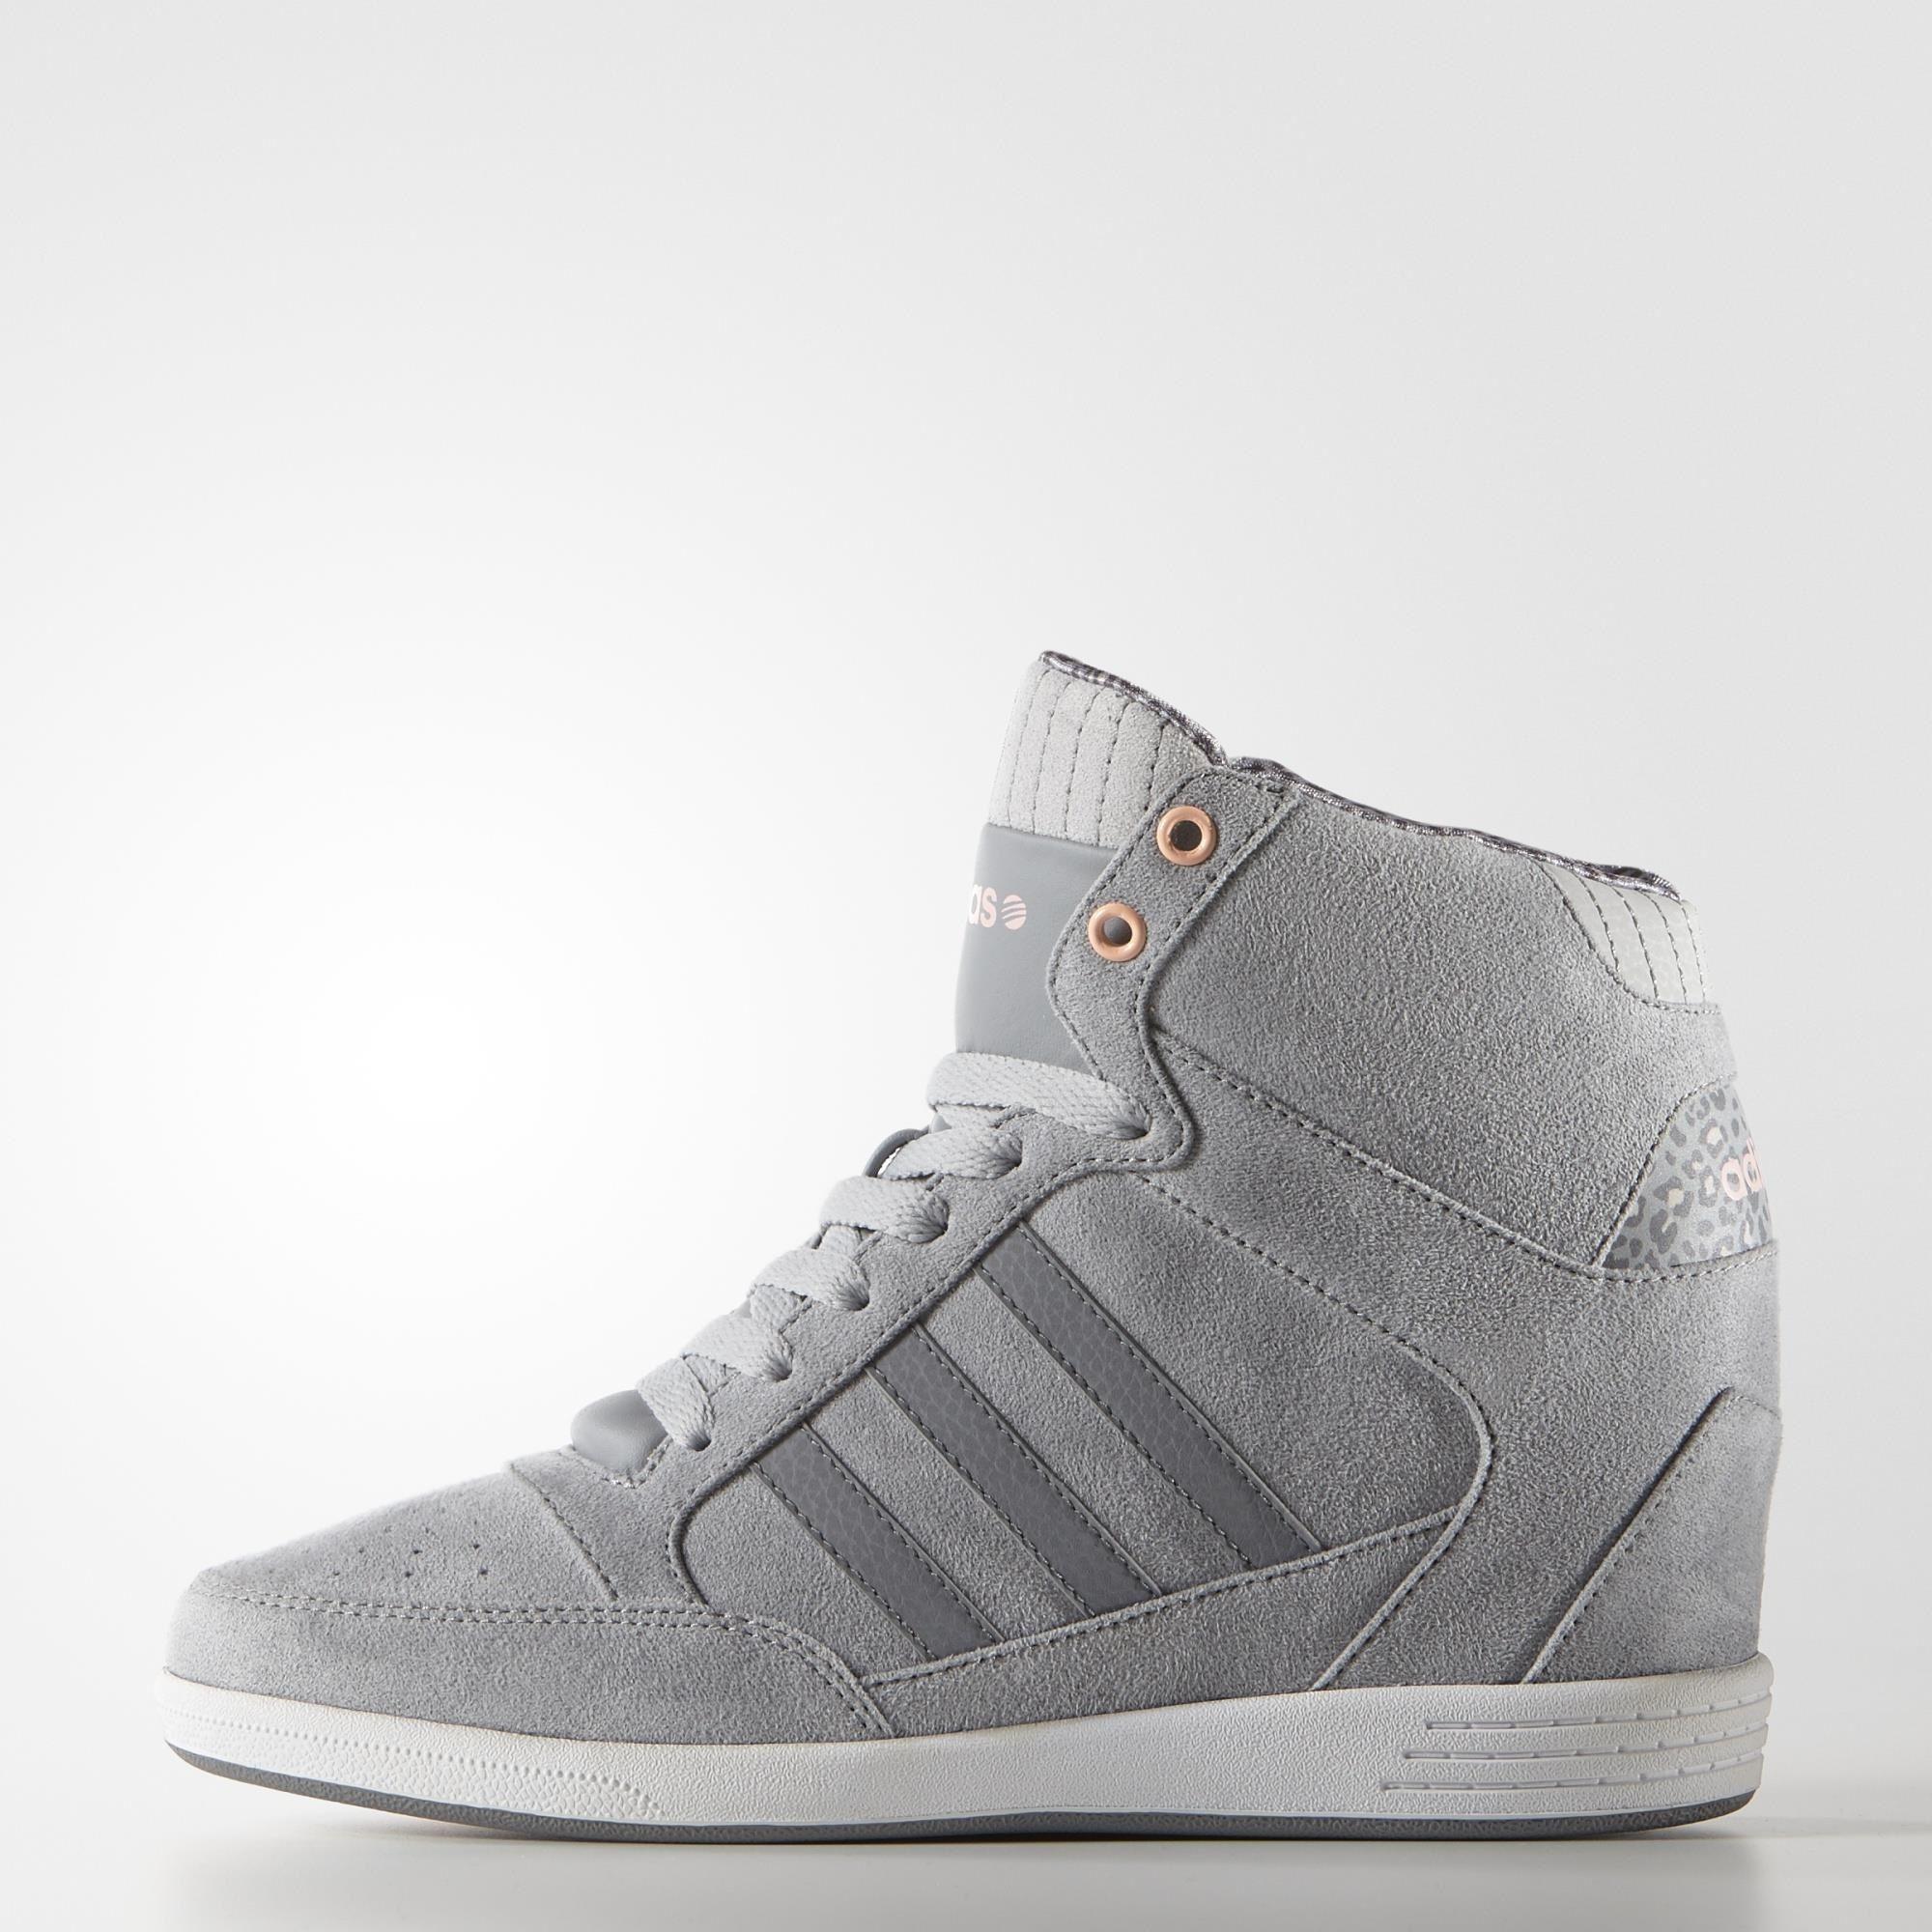 adidas WENEO Super Wedge Shoes - Grey | adidas US